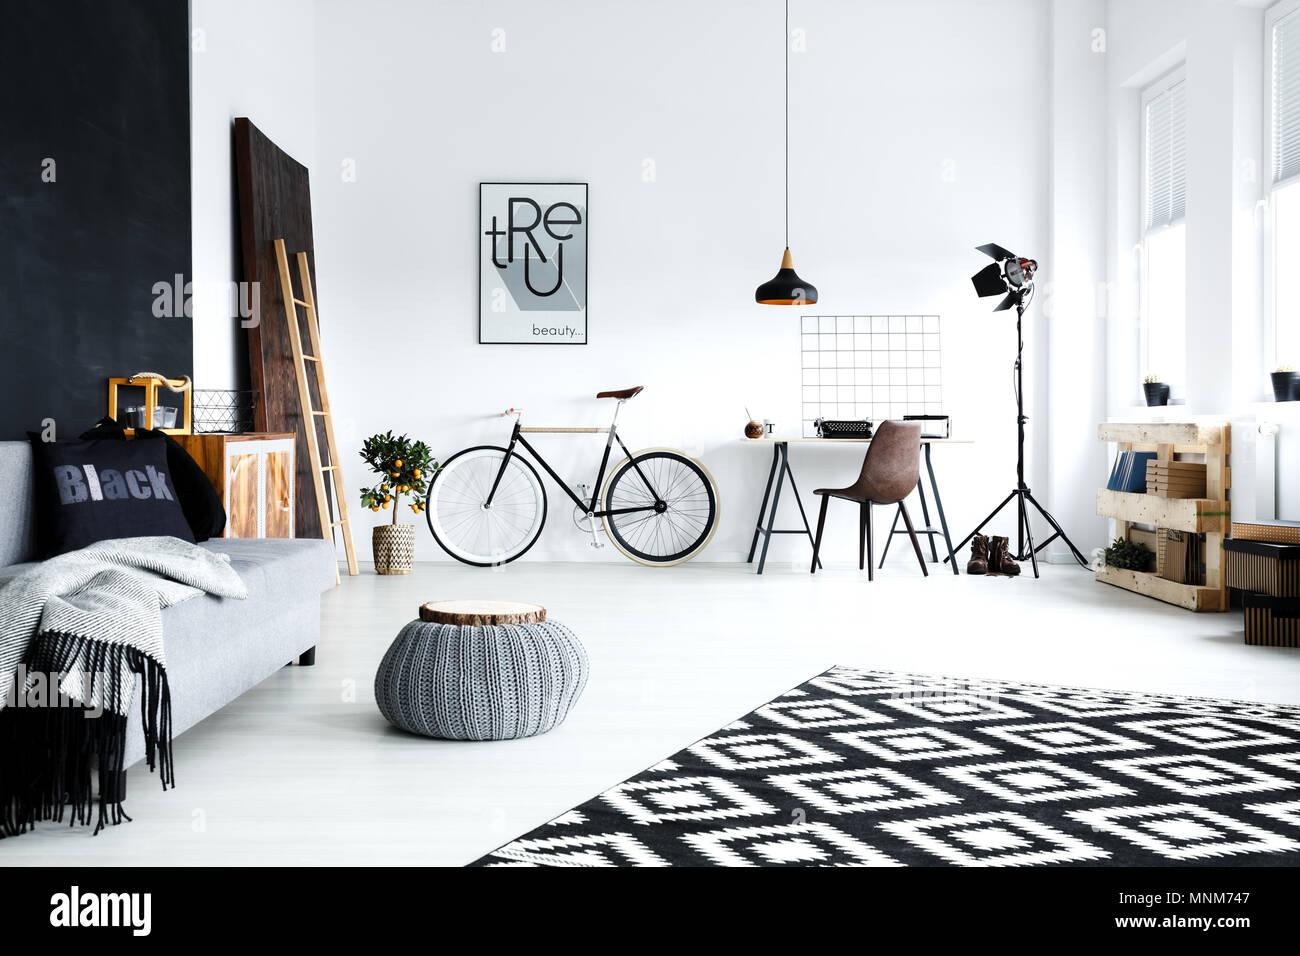 Plan Ouvert, studio avec canapé blanc, vélo, pouf, 24 Photo Stock